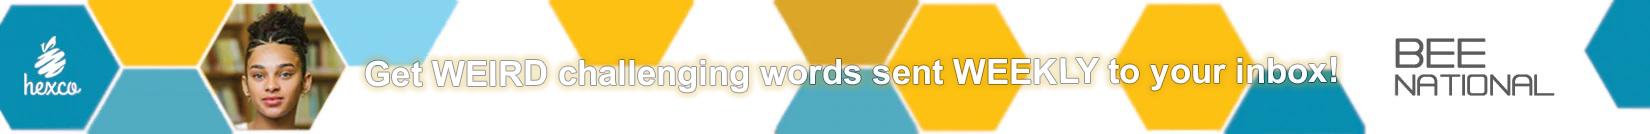 get weird challenging words sent weekly to your inbox